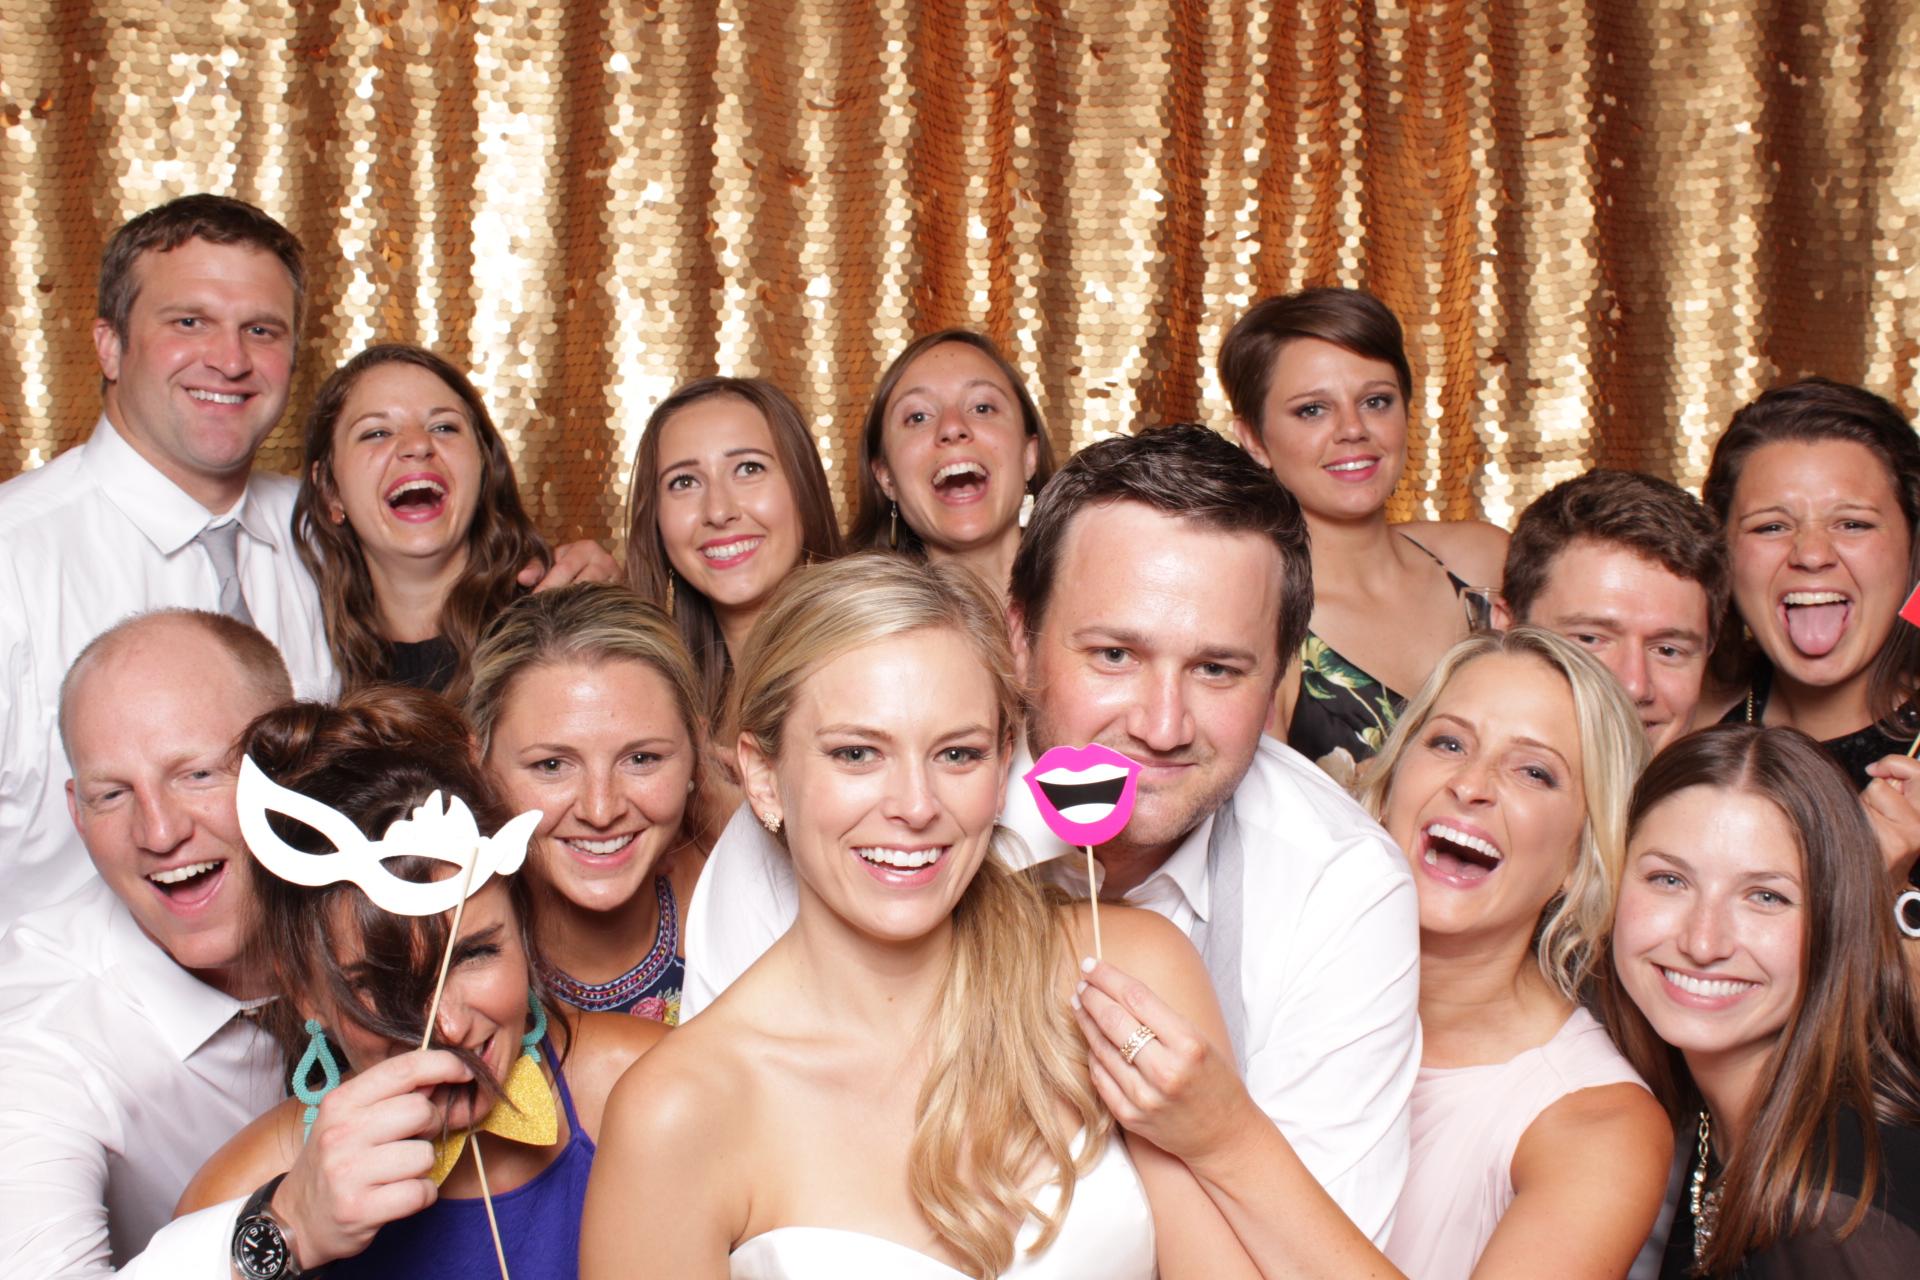 Minneapolis_wedding_photo_booth_Machine_Shop (25).jpg